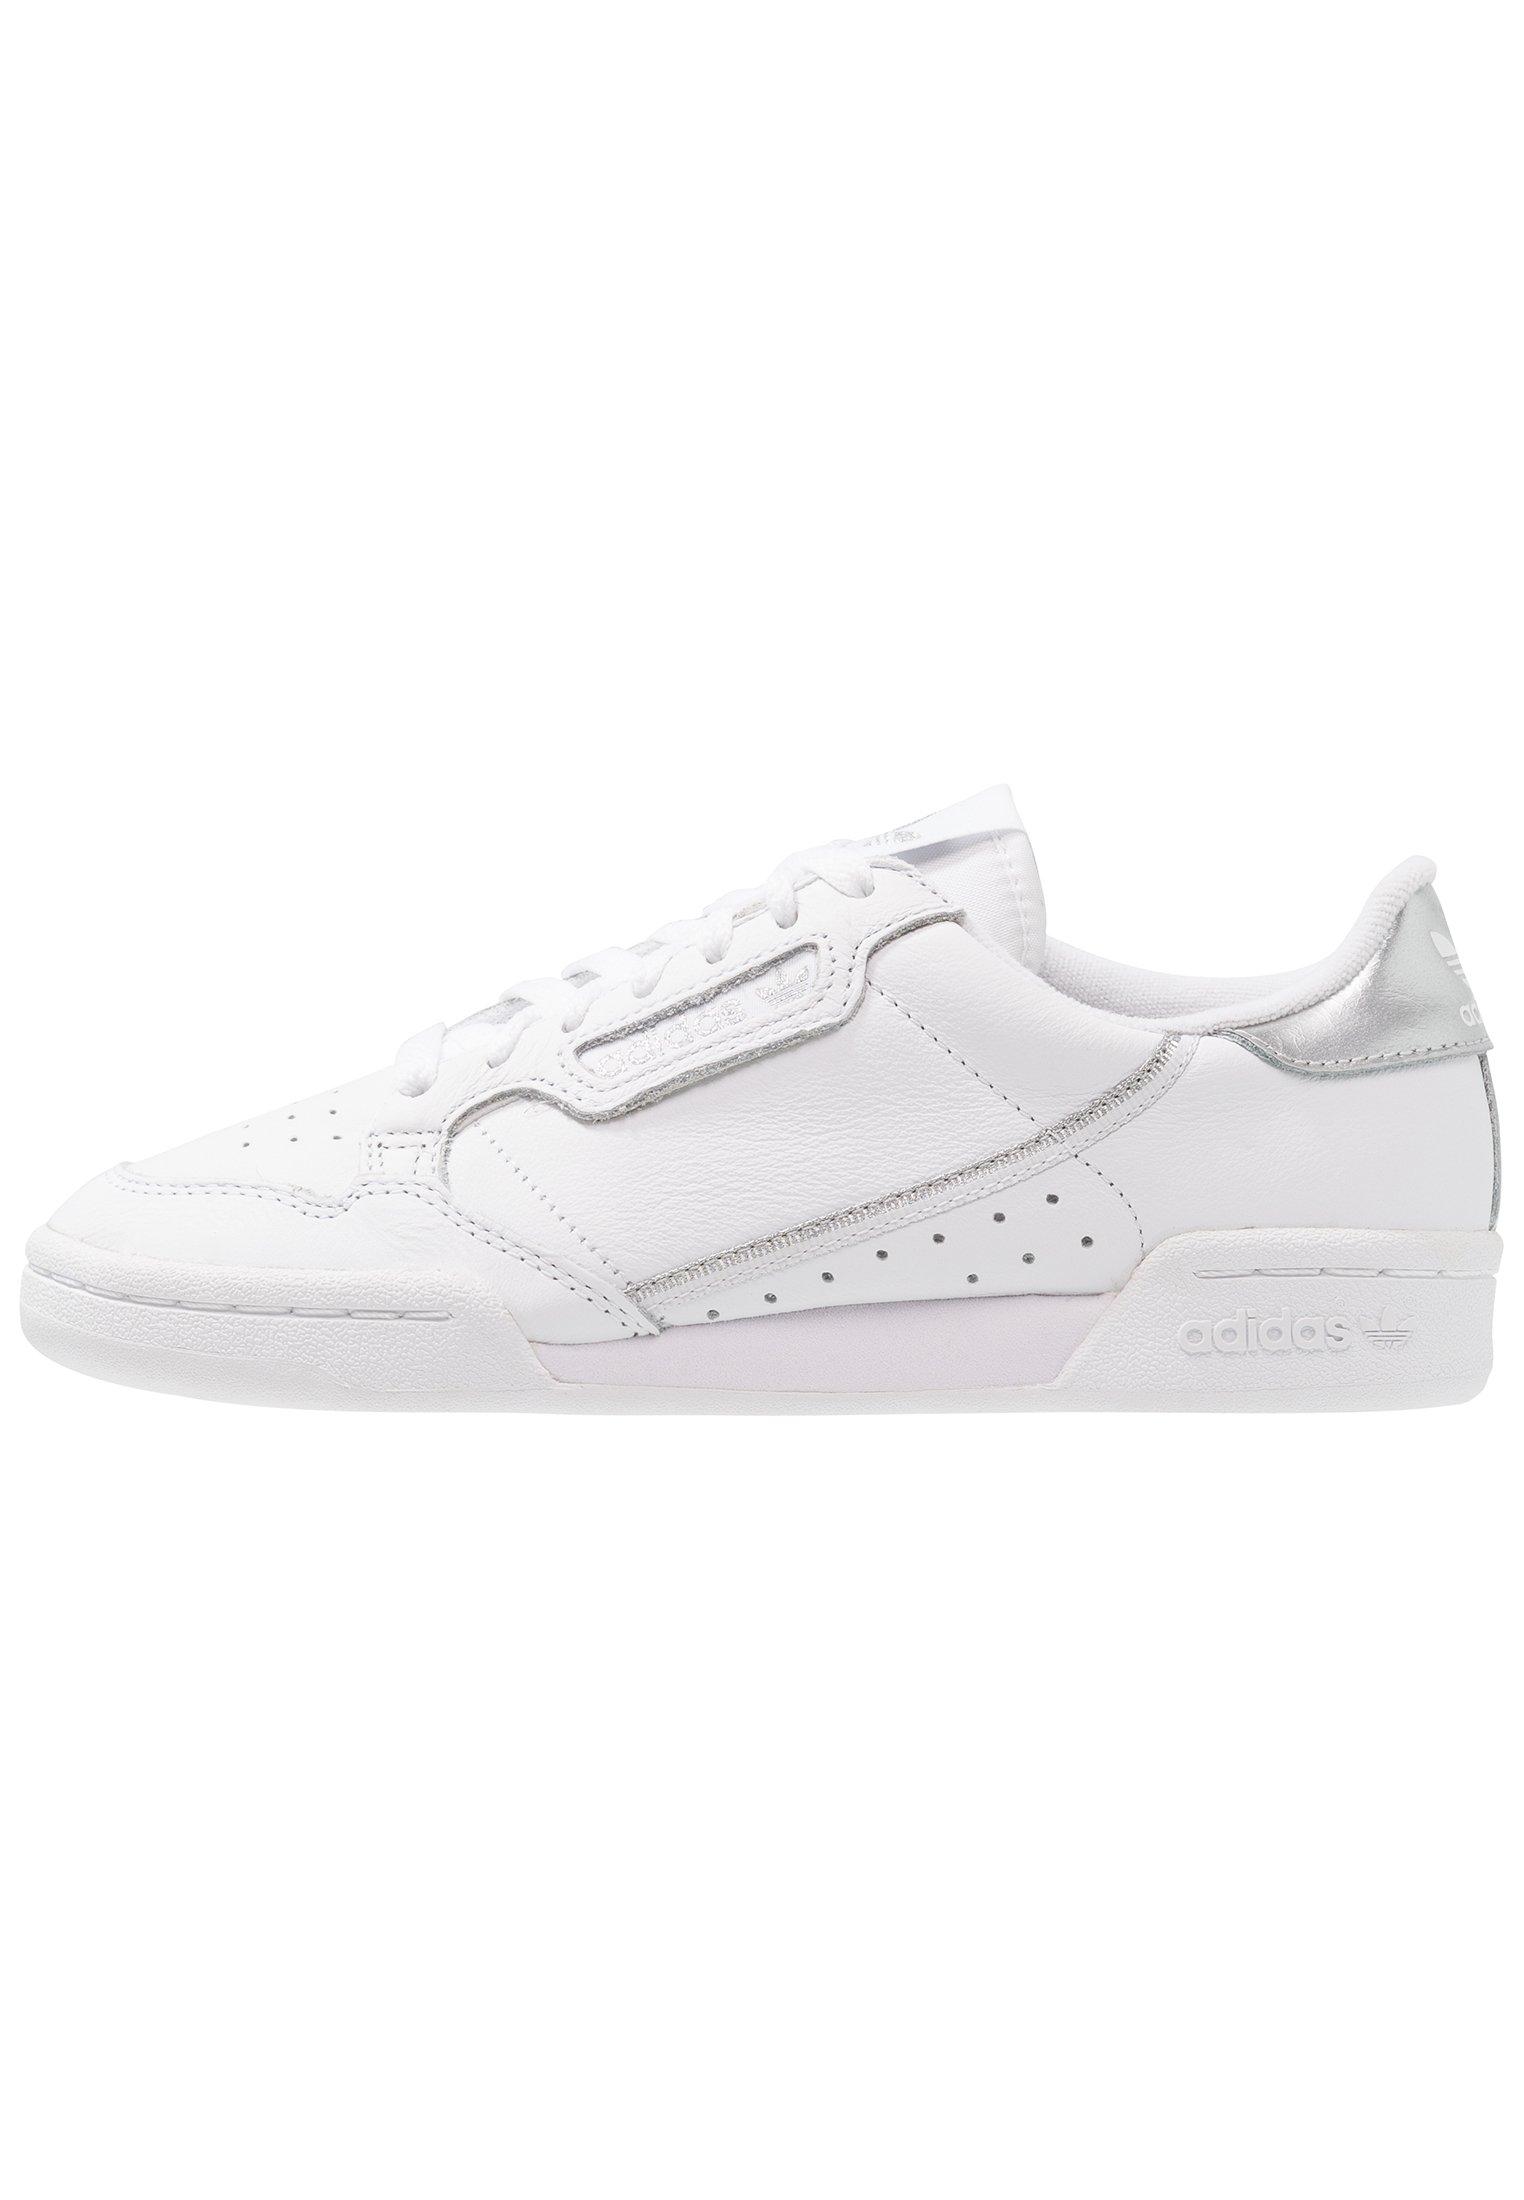 adidas Originals CONTINENTAL 80 - Baskets basses - footwear white/silver metallic